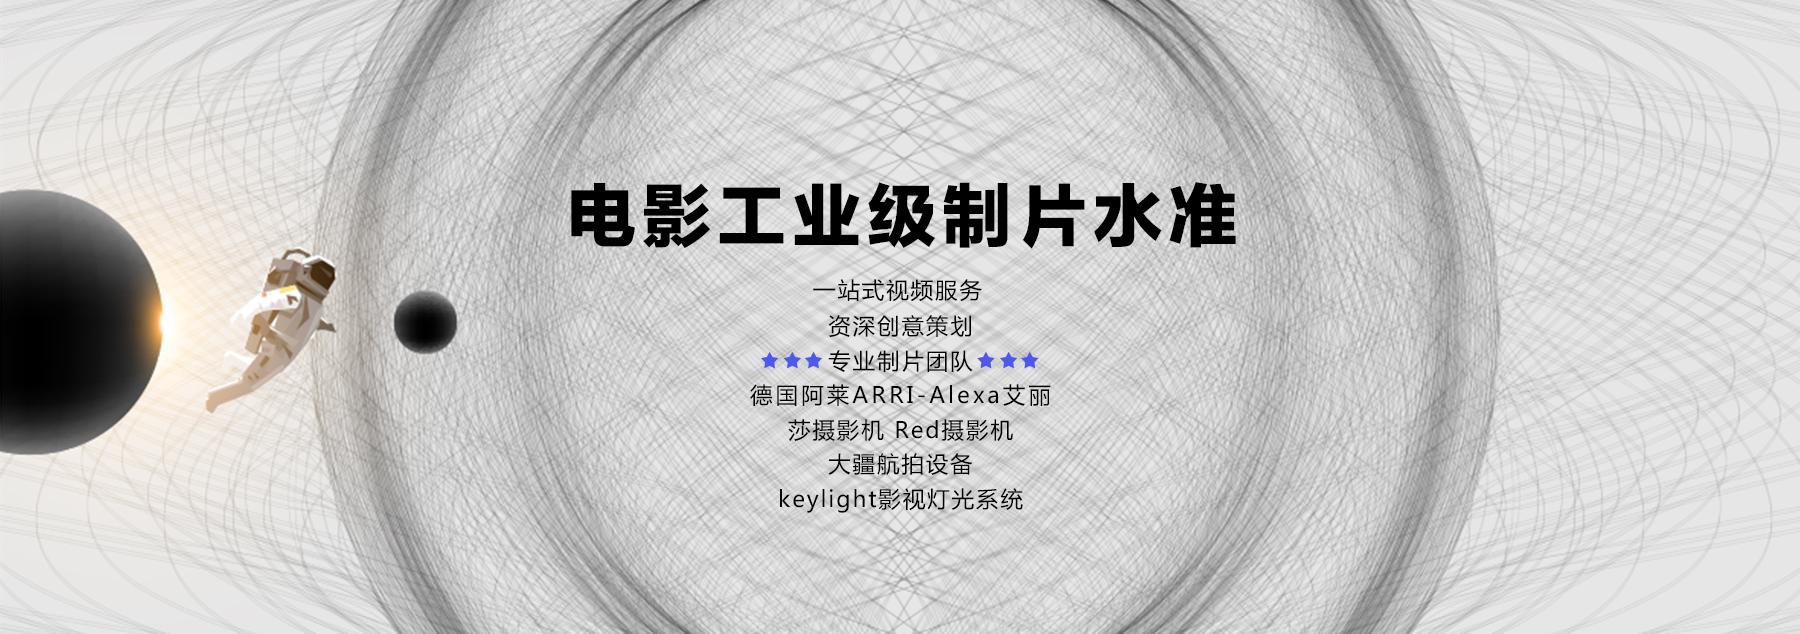 济南宣传片banner图